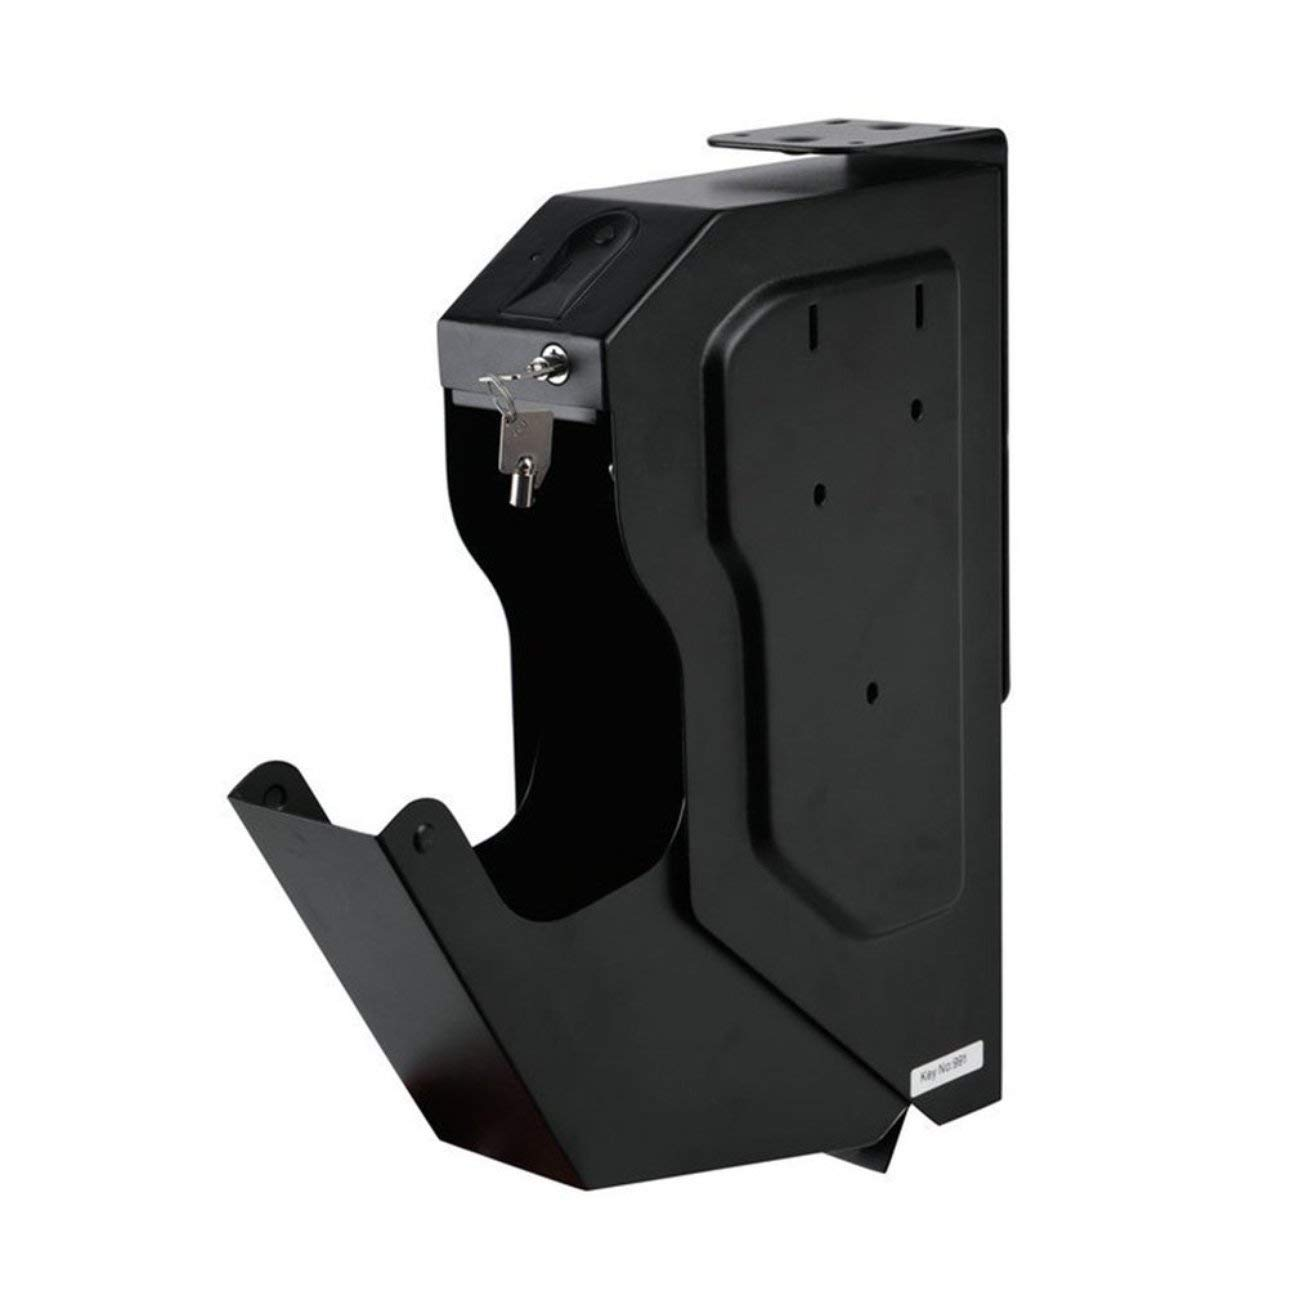 Cassaforte biometrica di impronte digitali Cassaforte di sicurezza in acciaio laminato a freddo Jiobapiongxin